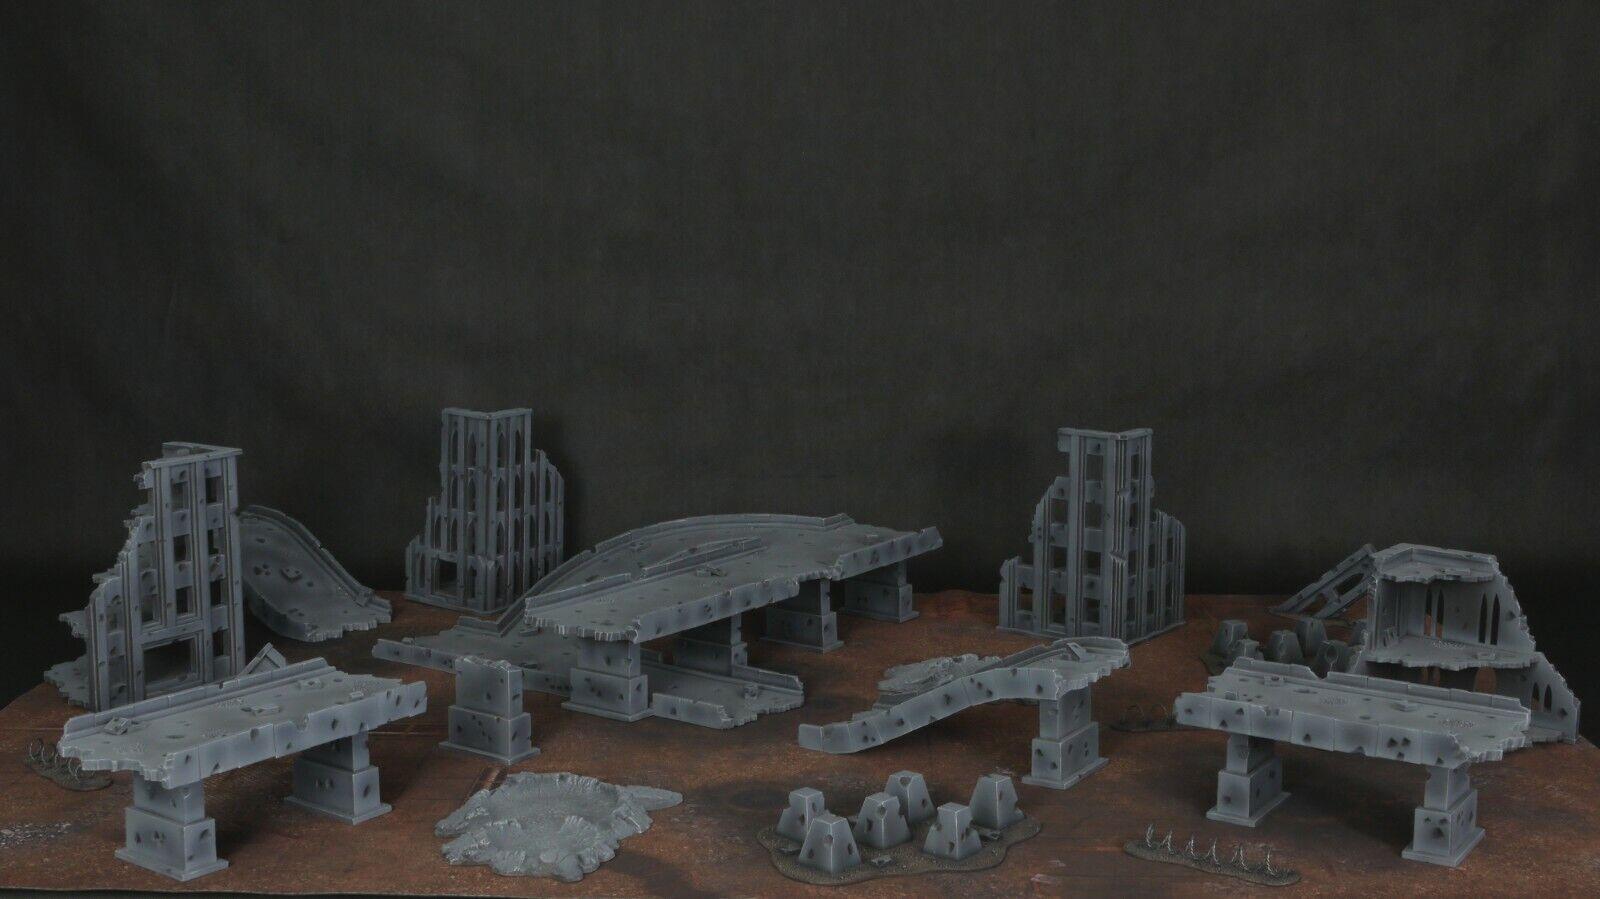 Autopista cityfight terreno Set (fotos en descripción)